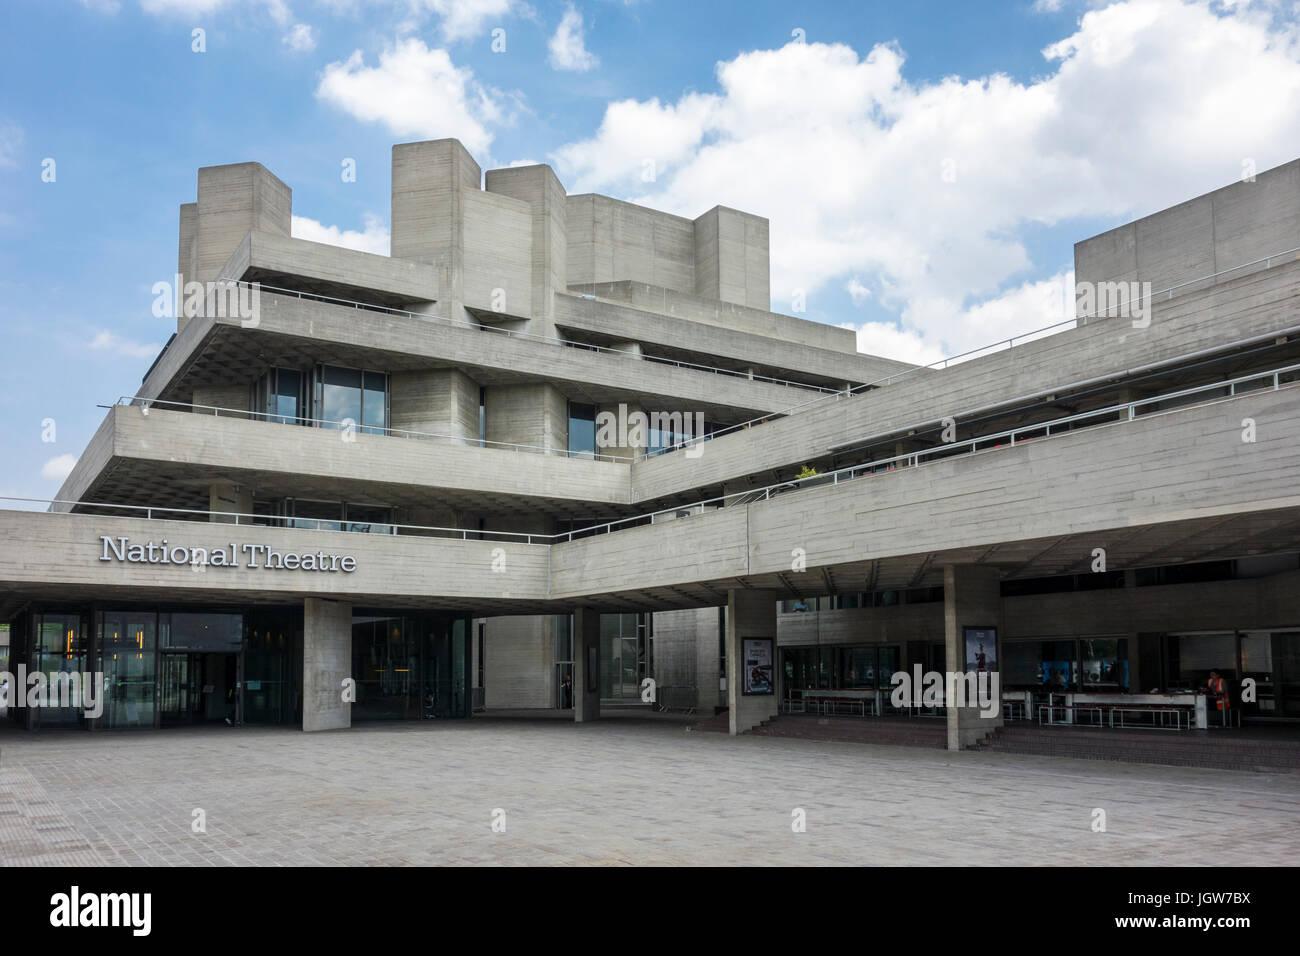 Brutalismus London: The Royal National Theatre Brutalist / Brutalismus Gebäude von Denys Lasdun. Southbank, Stockbild